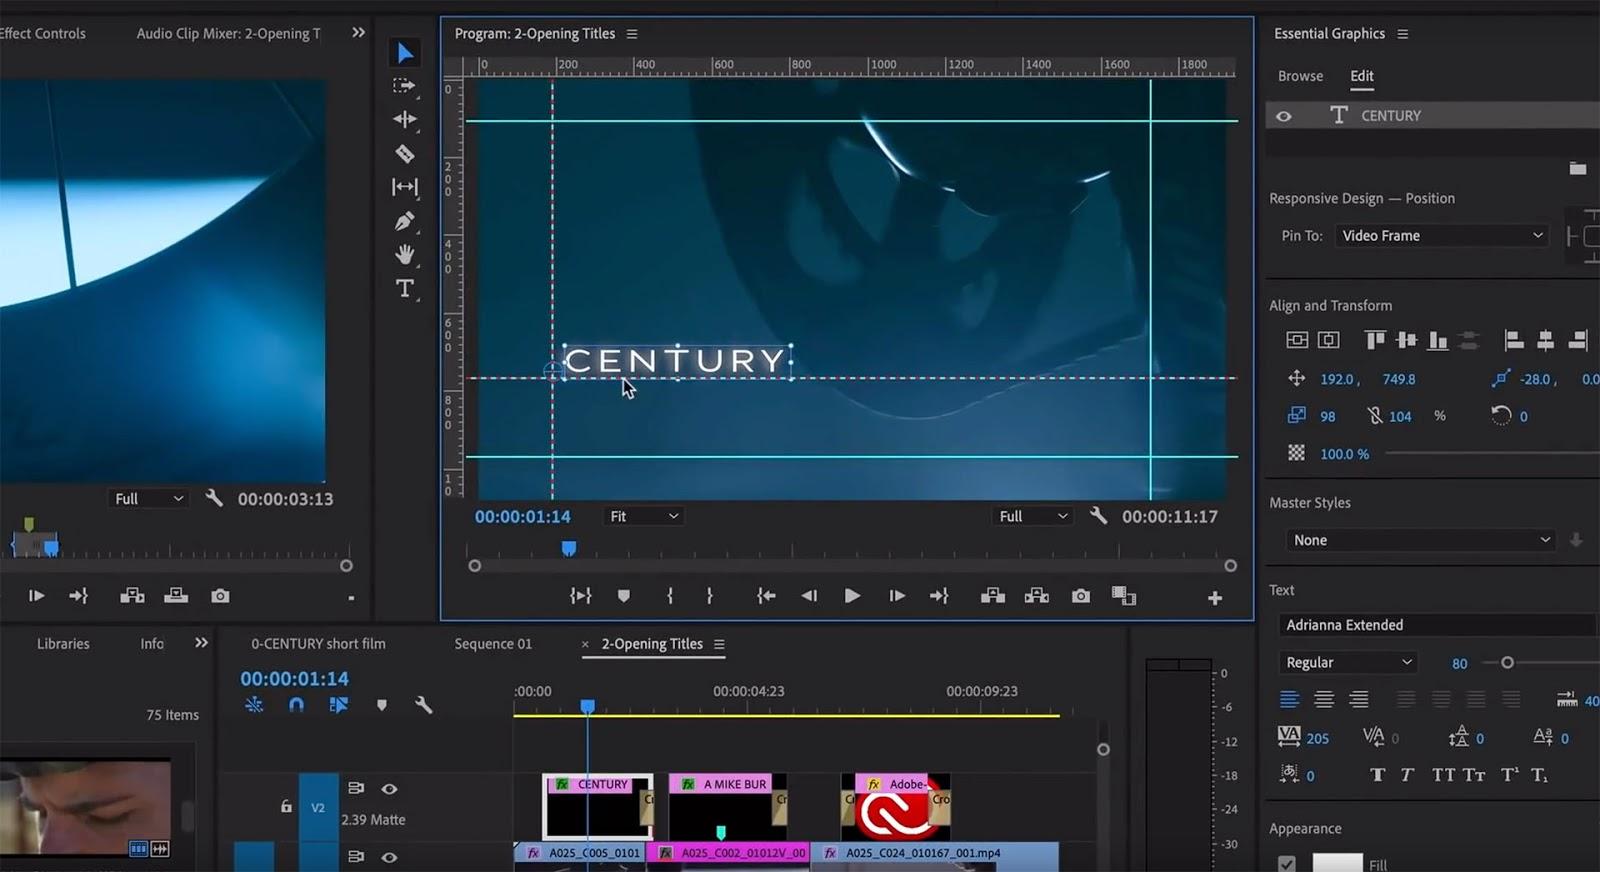 Adobe Premiere Pro CC 2019 v13.1.3.44 (64 Bit) Full Version - Get ...